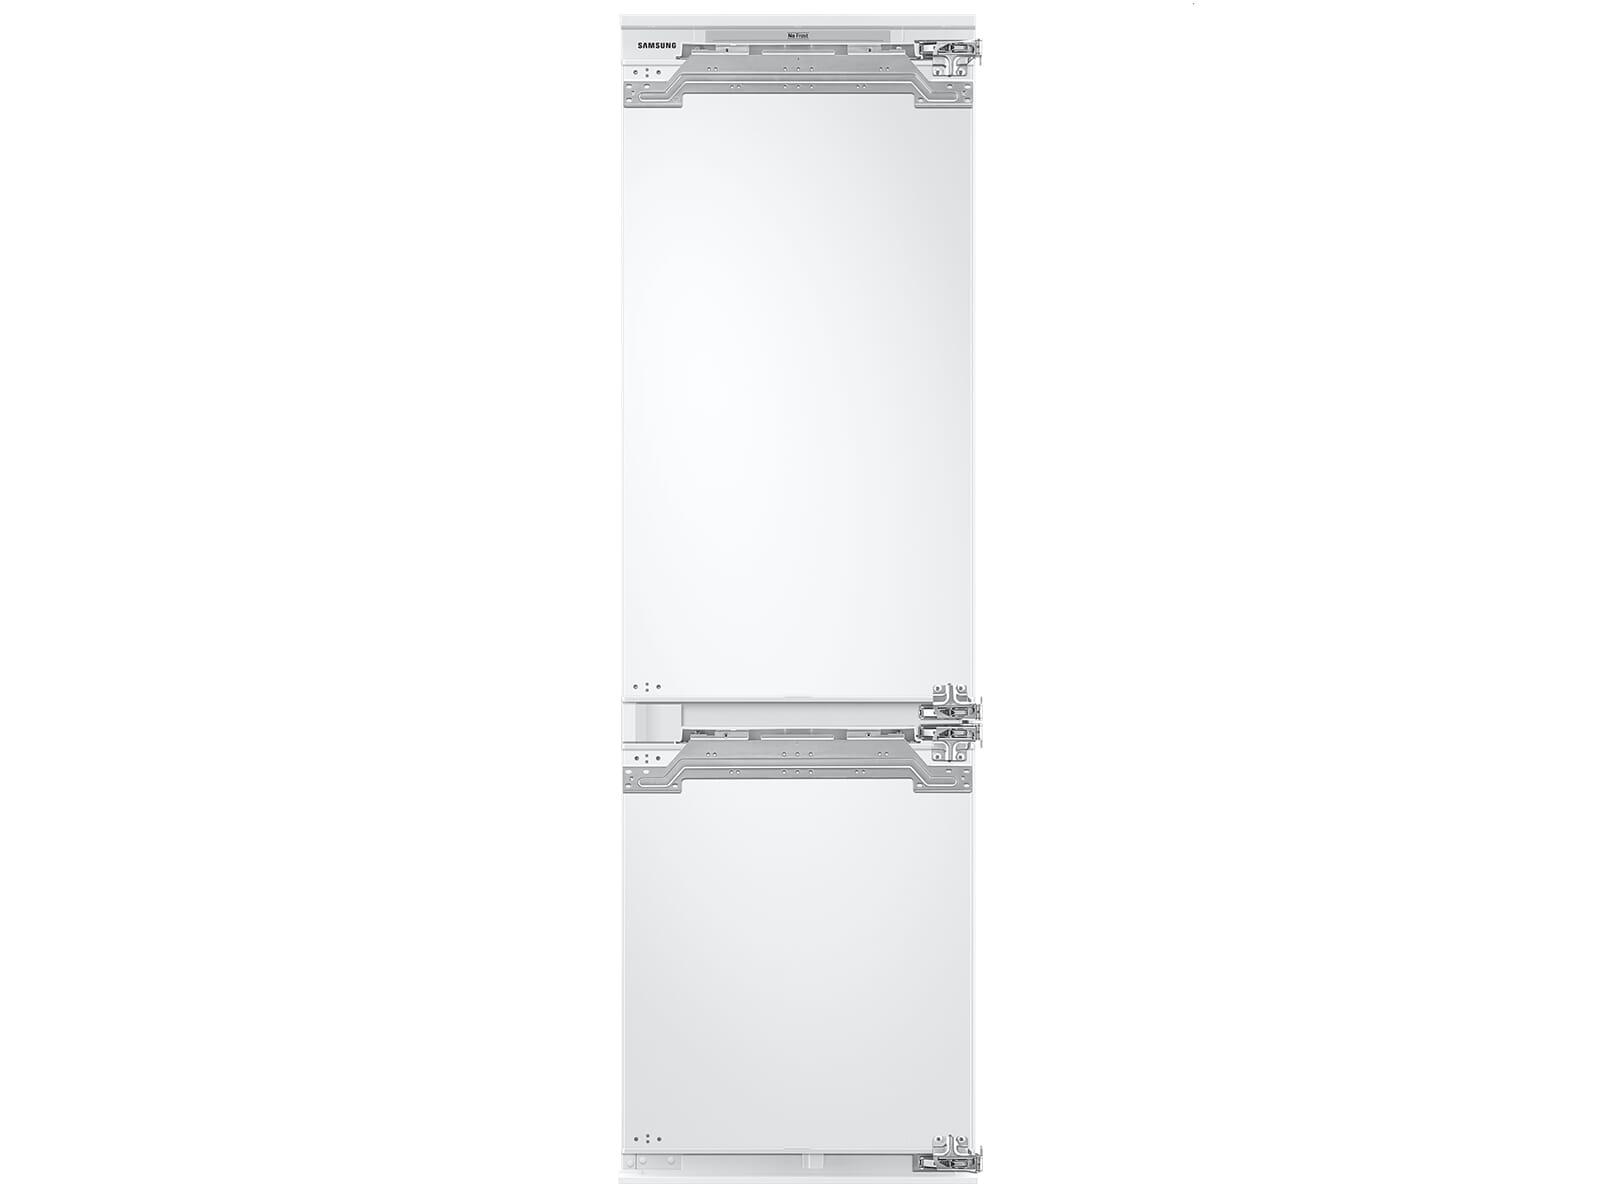 Samsung BRB260134WW/EF Einbau-Kühl-Gefrierkombination